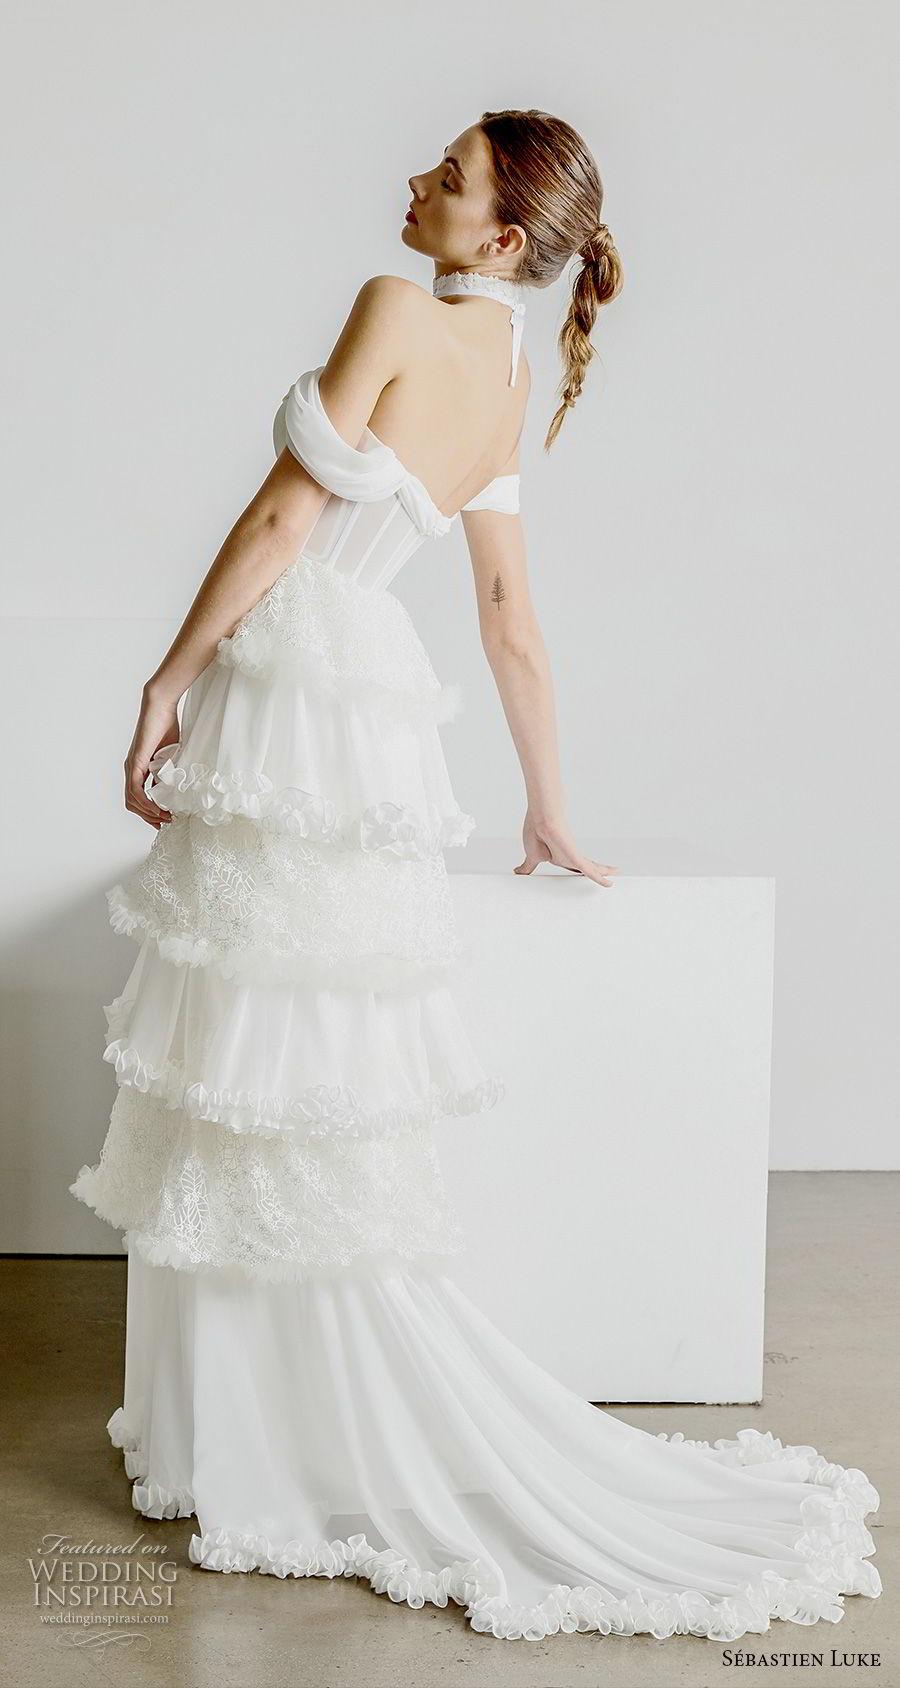 sebastien luke spring 2019 bridal off the shoulder sweetheart neckline bustier bodice simple tiered skirt romantic modified a line wedding dress short train (1) bv